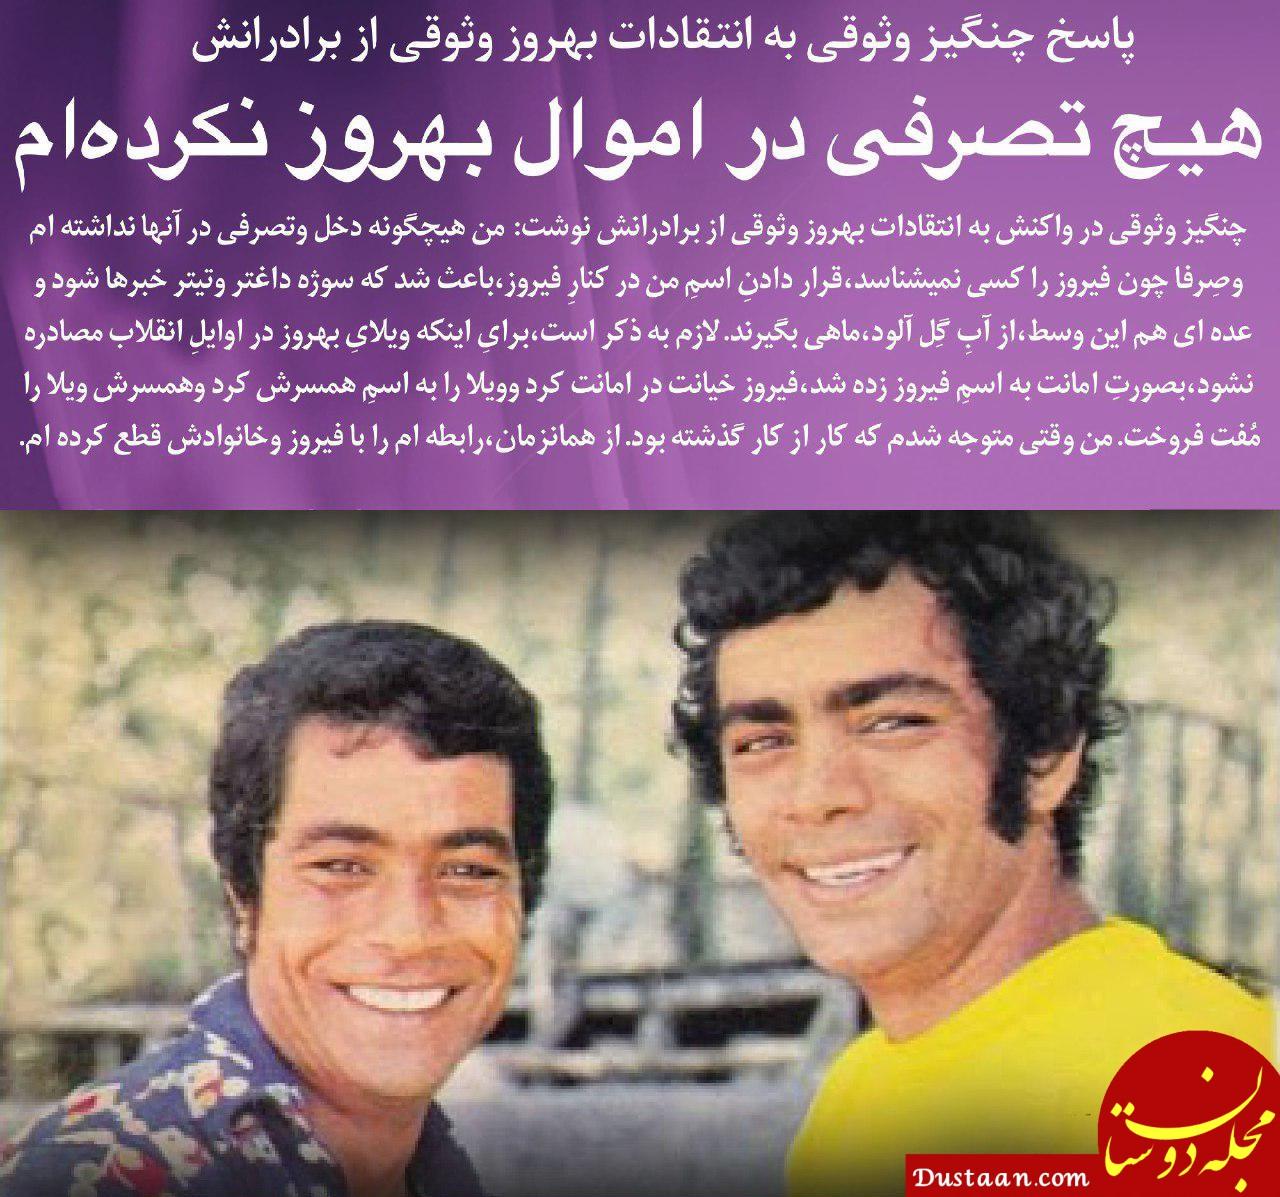 www.dustaan.com پاسخ چنگیز وثوقی به انتقادات بهروز وثوقی از بردرانش: برادرمان فیروز خیانت در امانت کرد